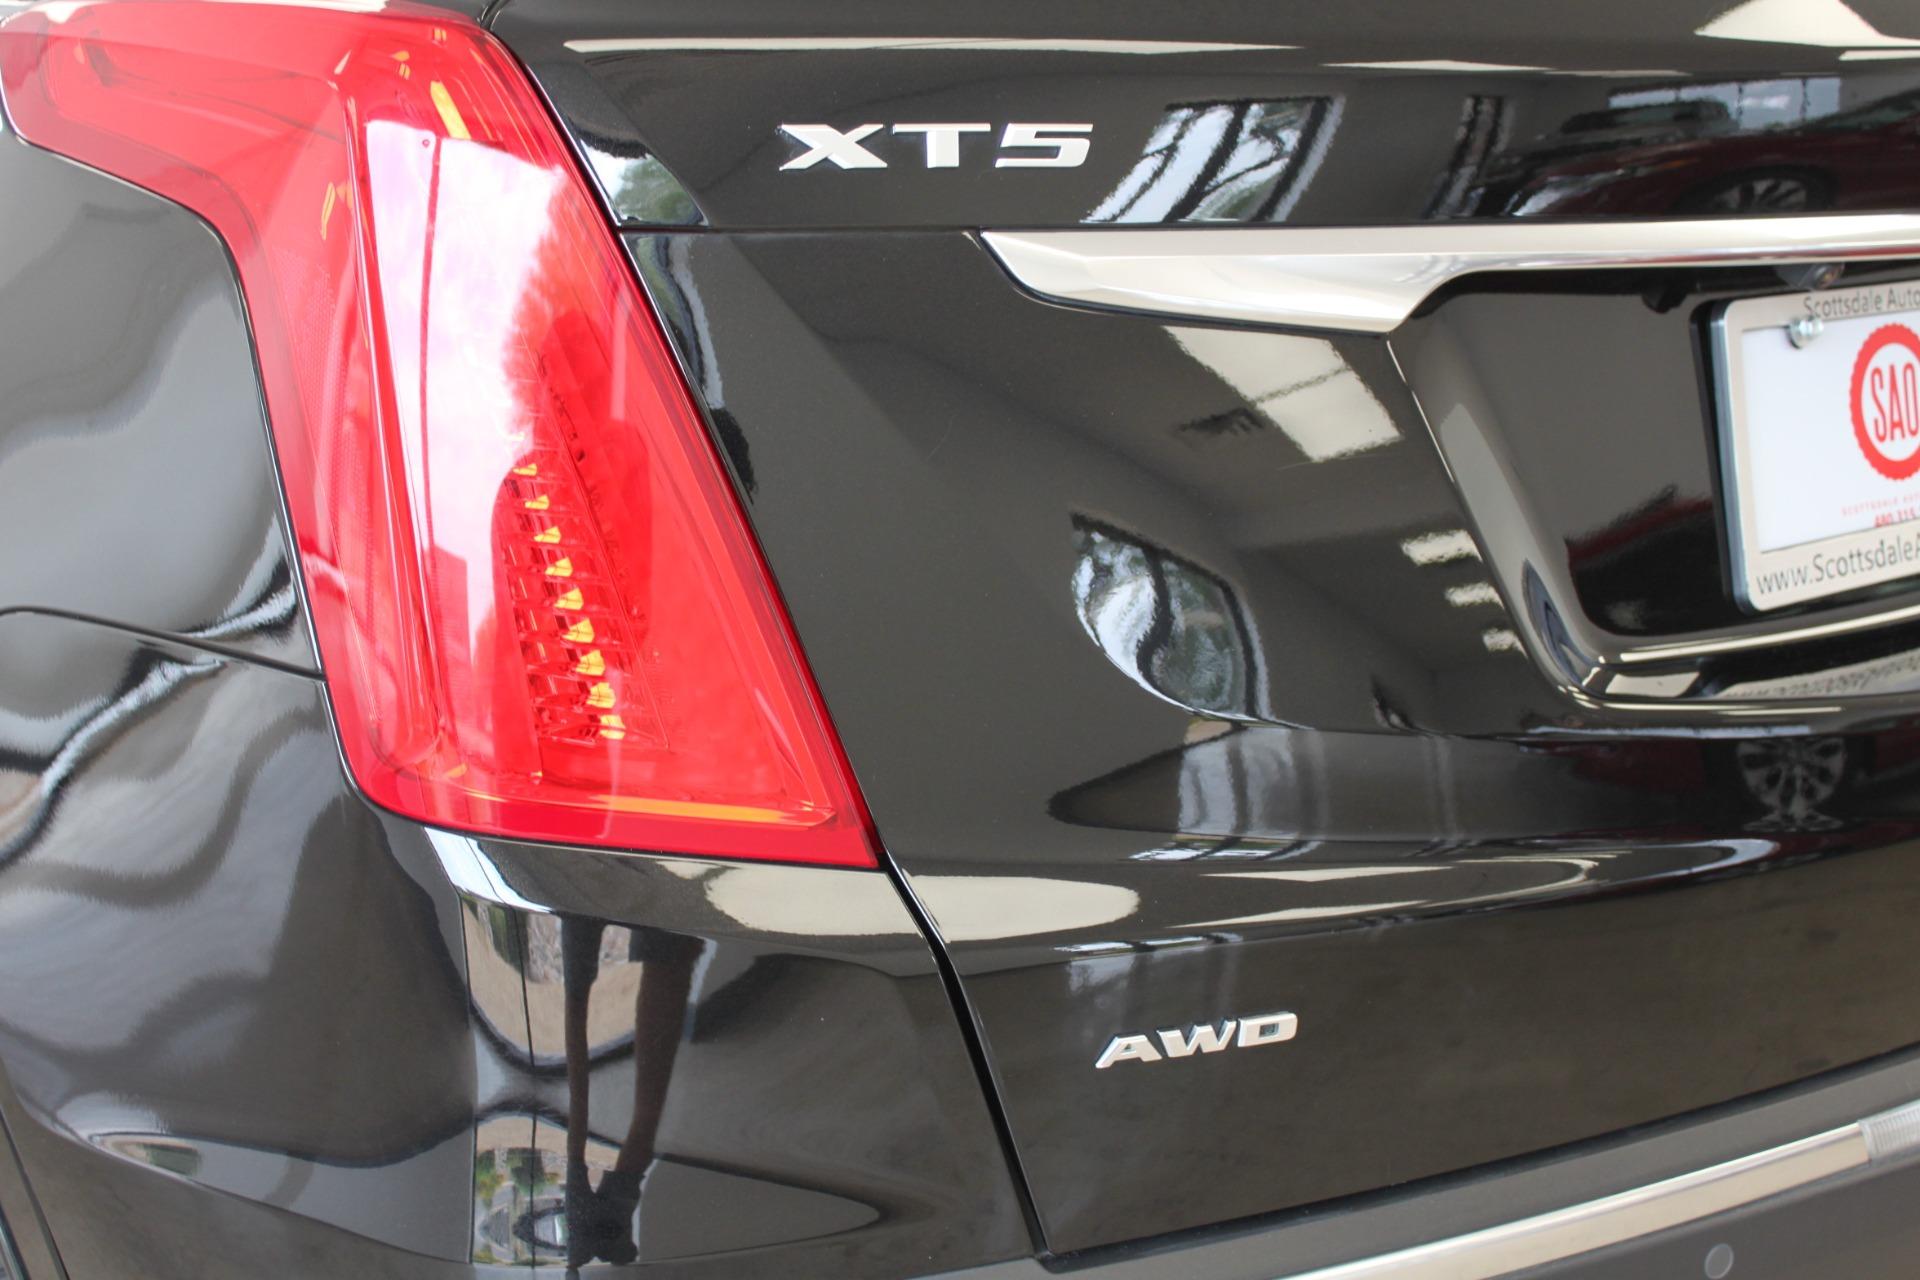 Used-2017-Cadillac-XT5-Luxury-All-Wheel-Drive-Luxury-AWD-Chevelle